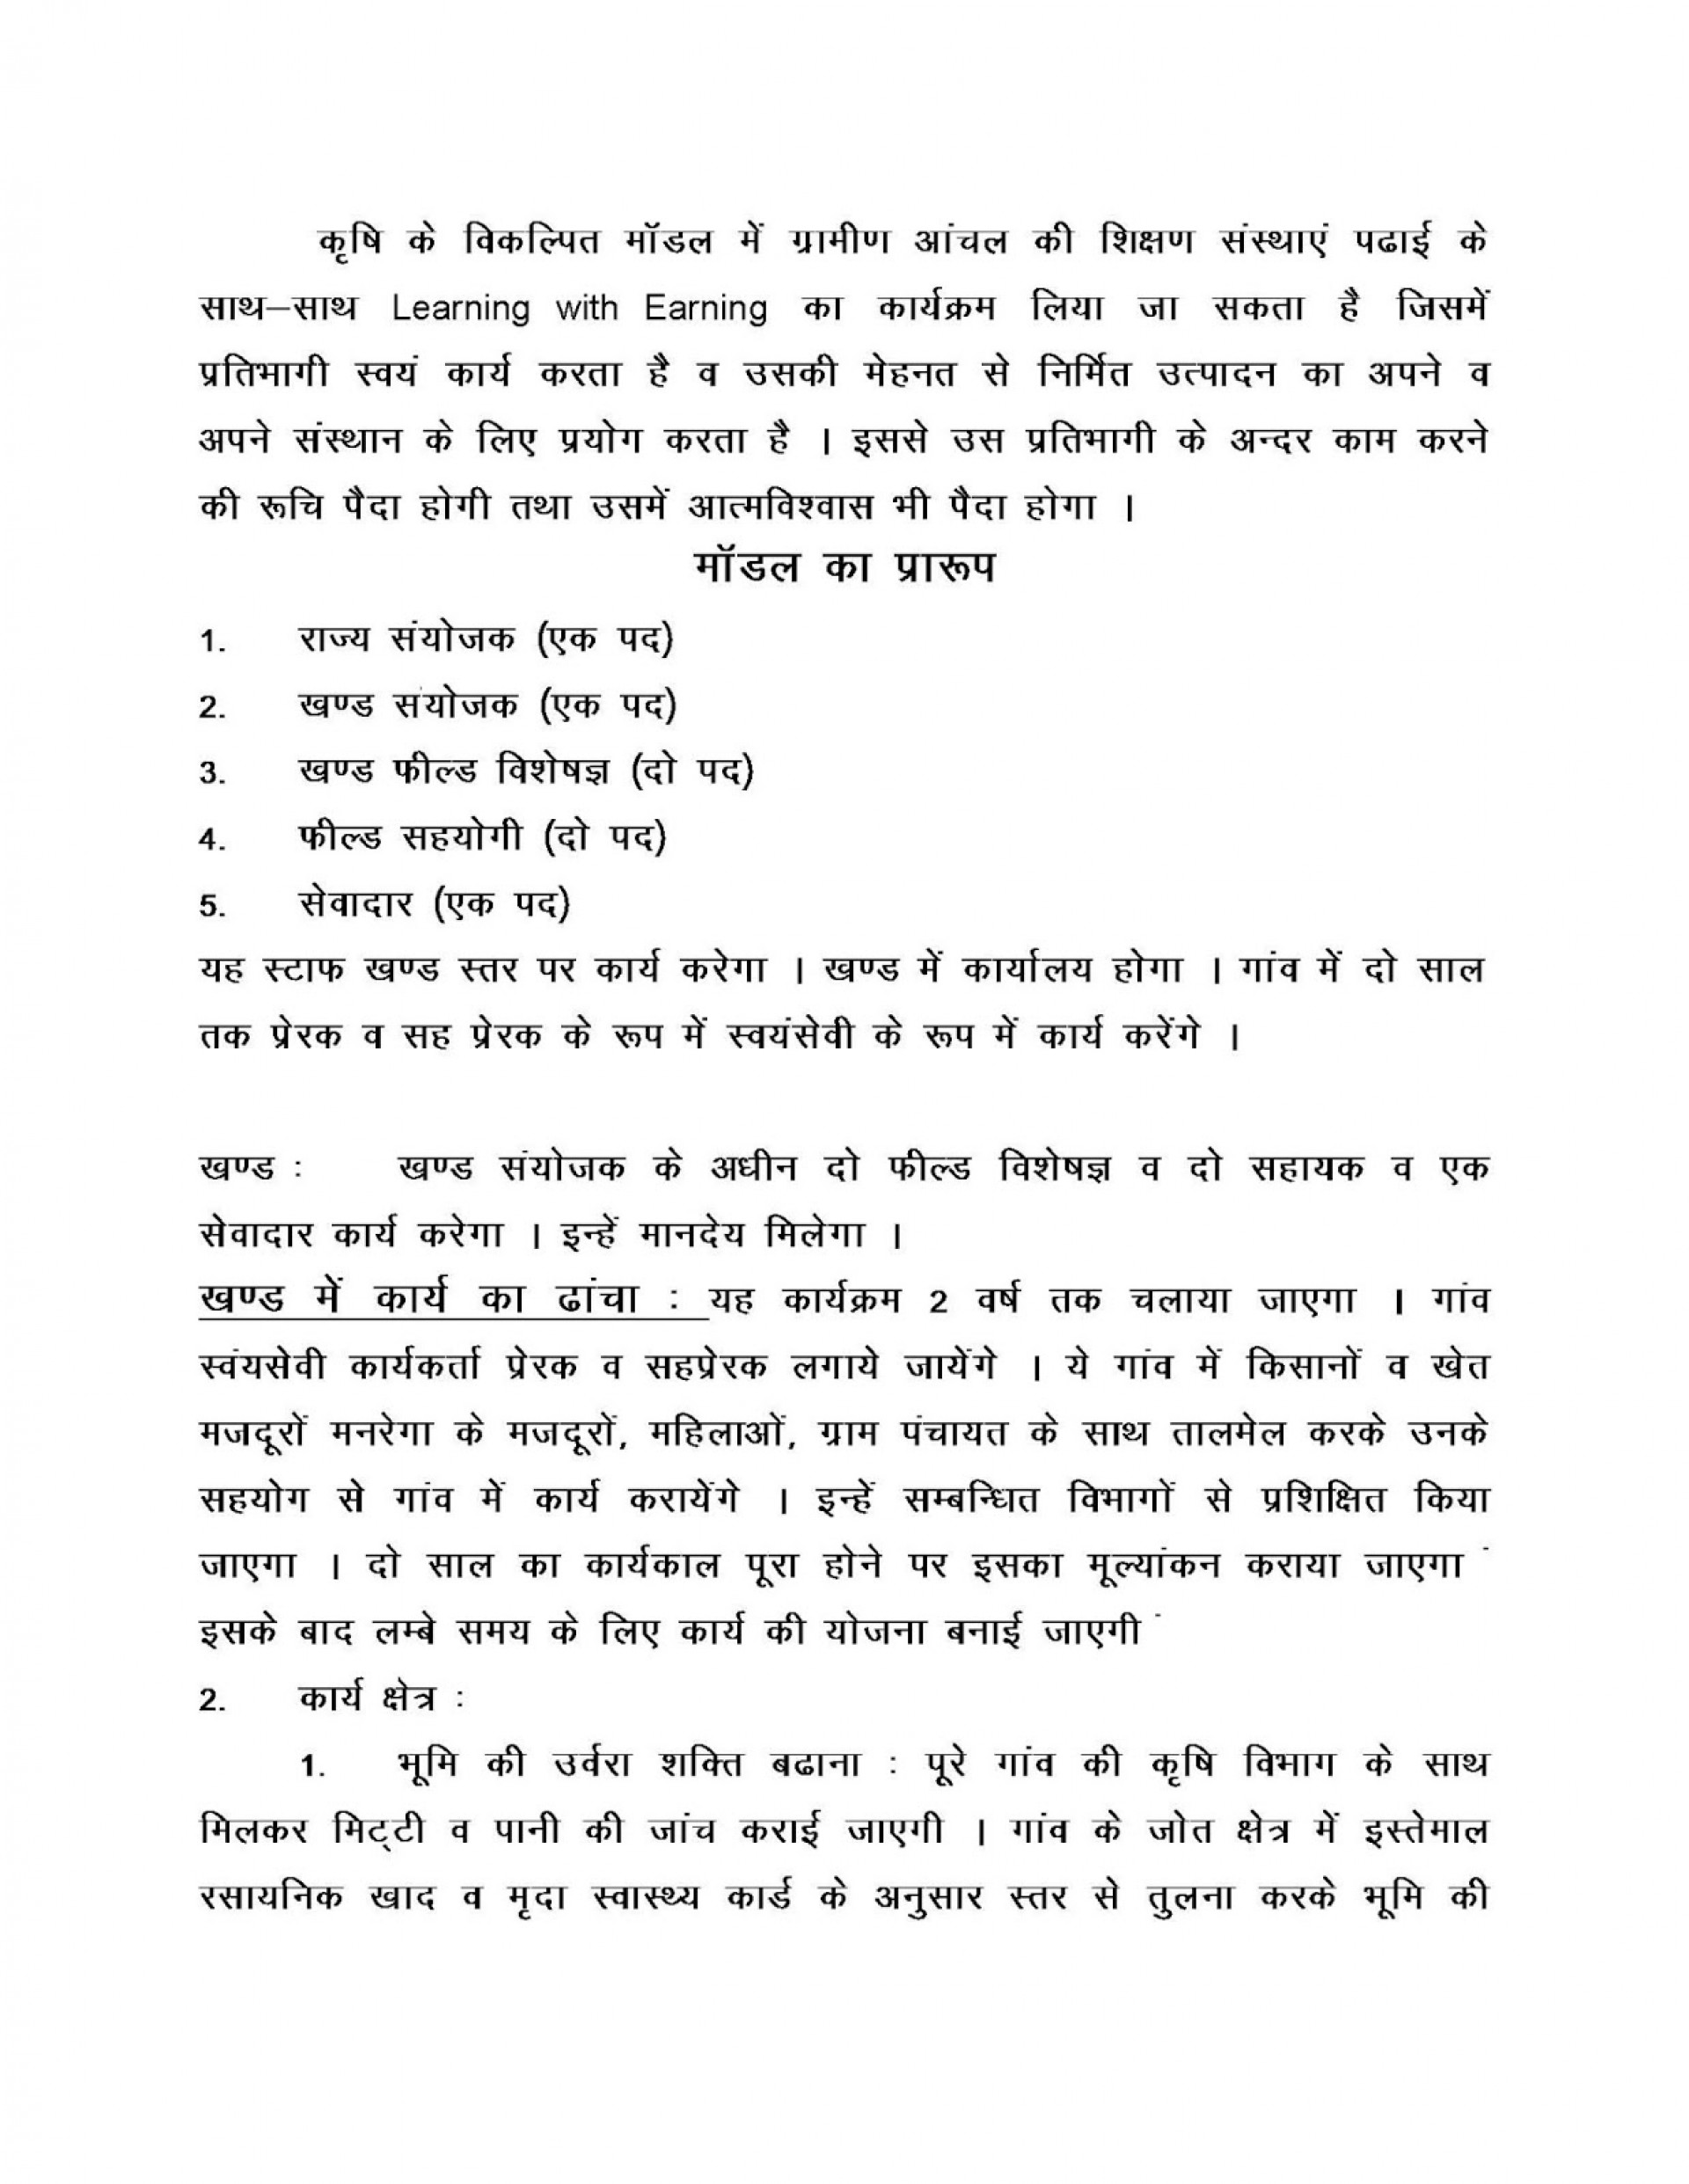 002 Hindi252bwork252bdr 252brajinder252bsingh Page 8 Lyric Essays Awesome Essay Examples 1920